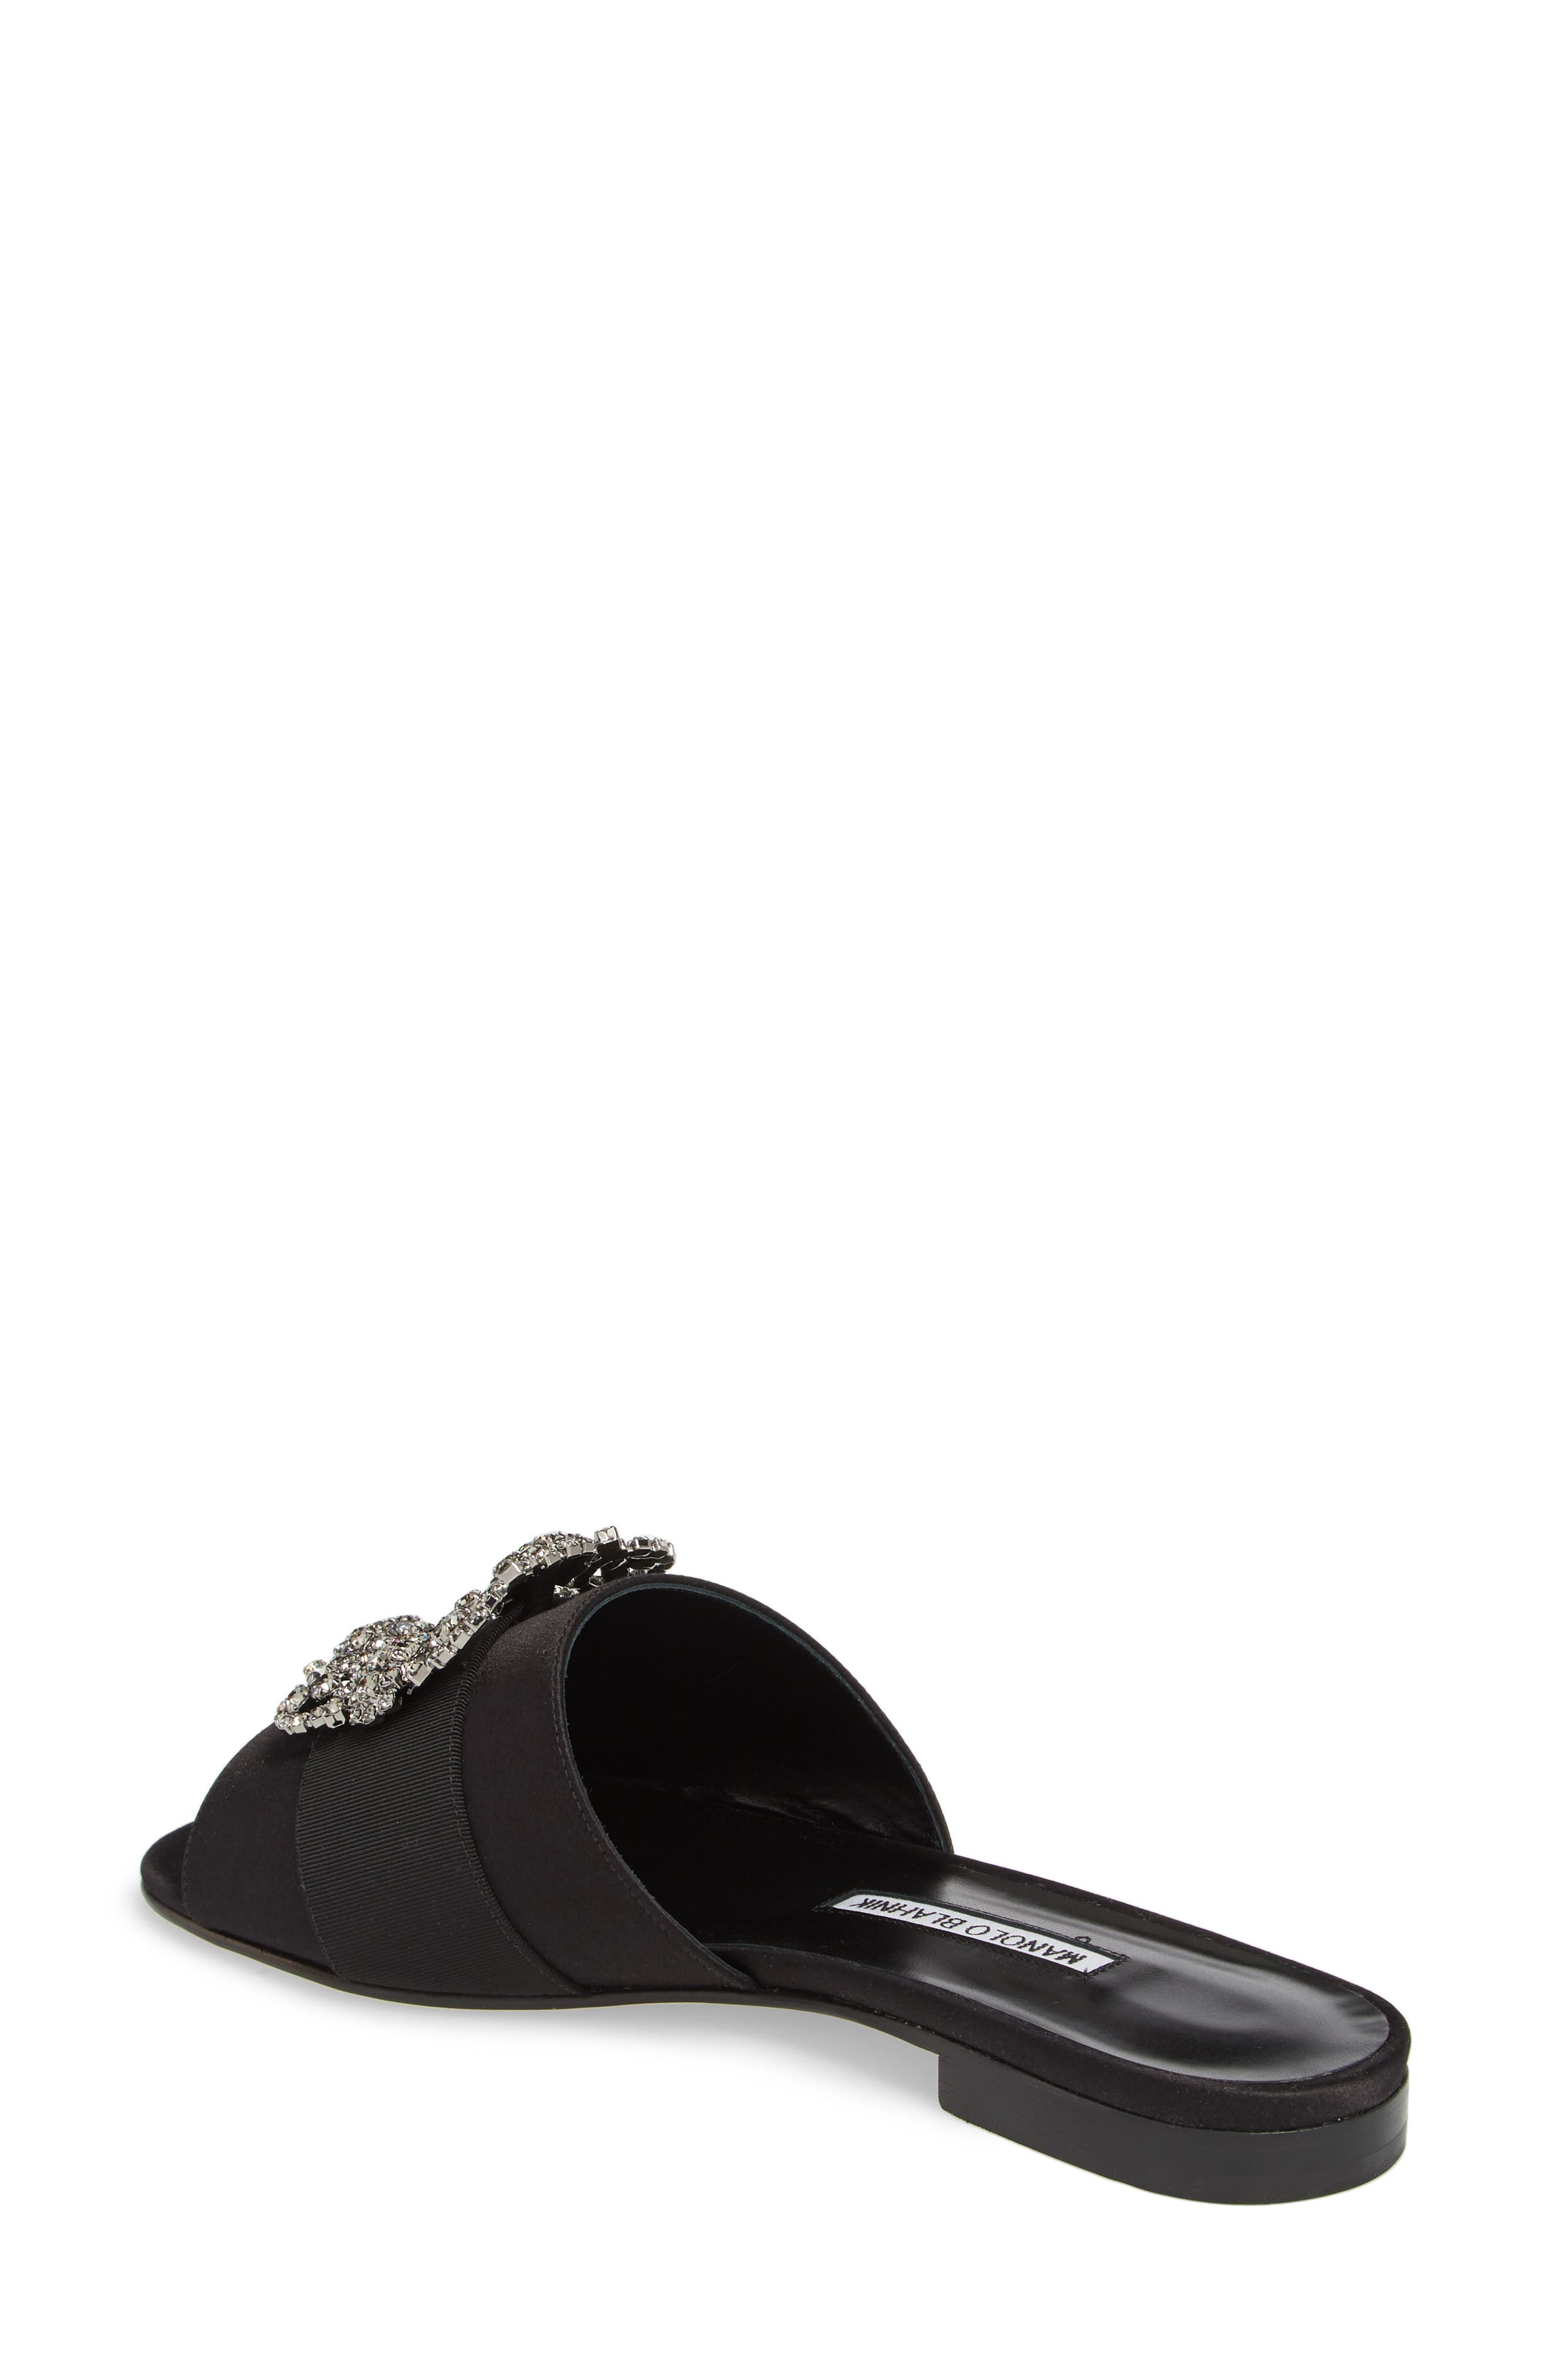 Alternate Image 2  - Manolo Blahnik Martamod Crystal Embellished Slide Sandal (Women)